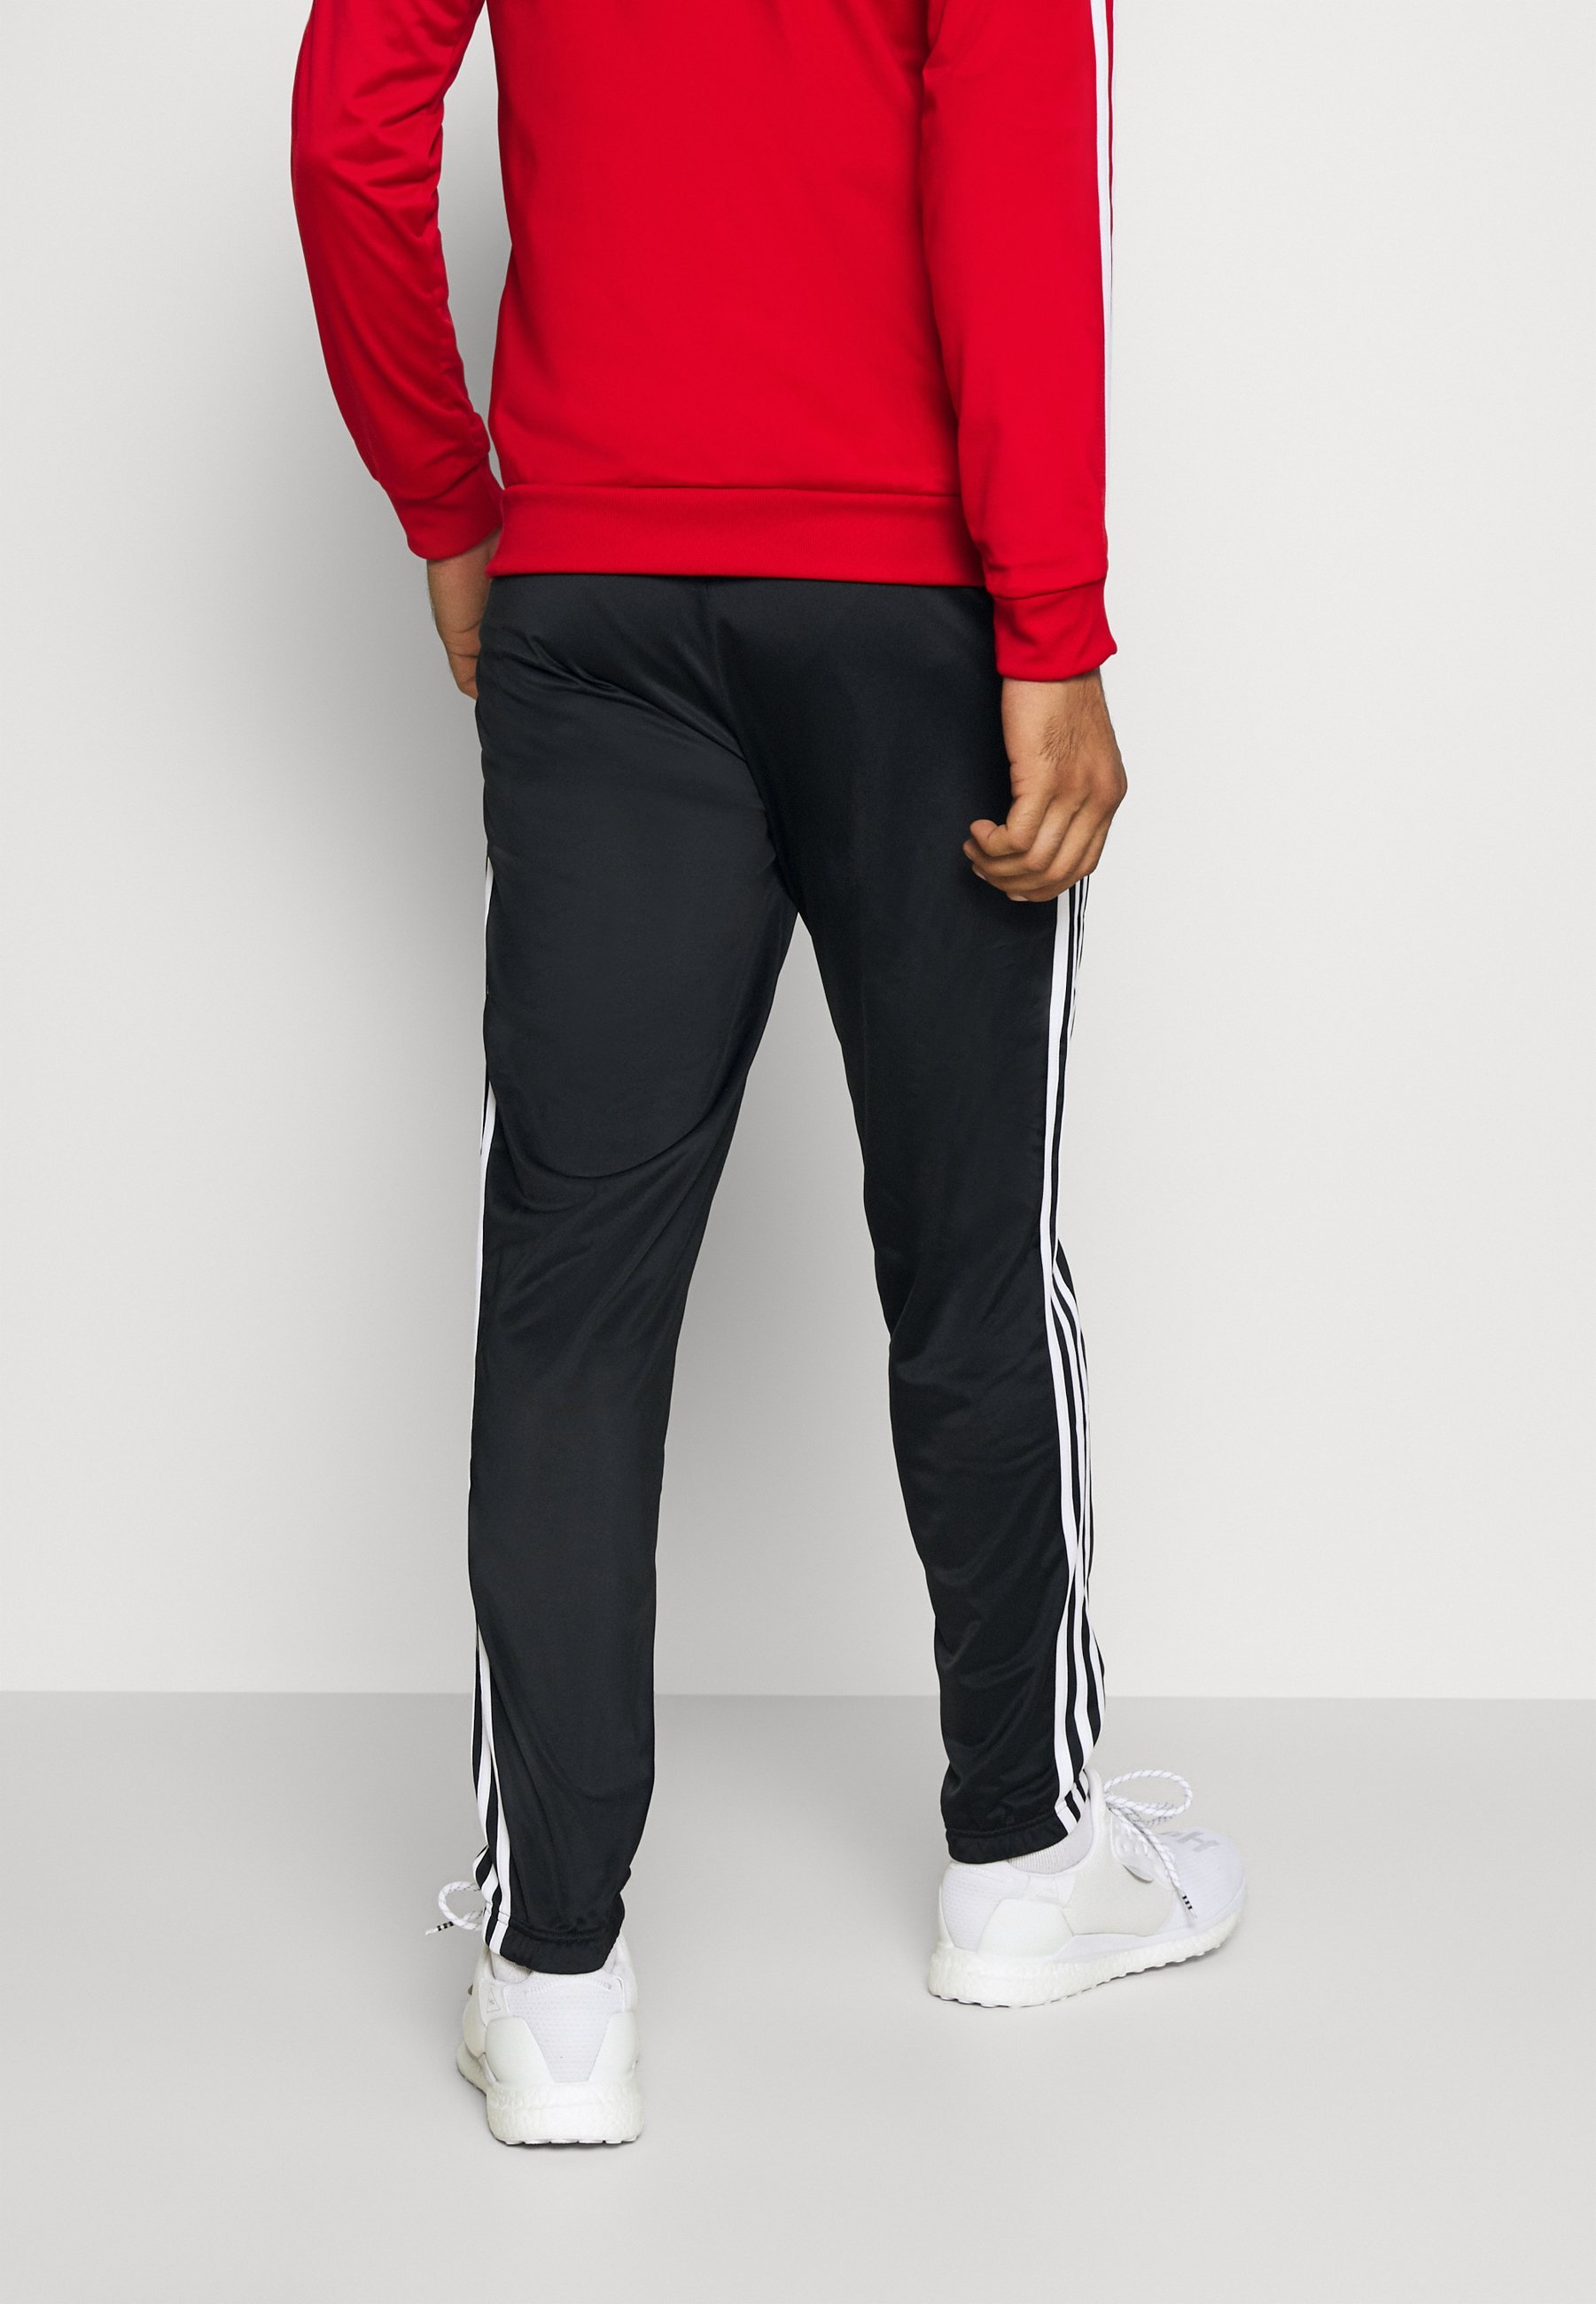 Adidas Performance Set - Dres Scarle/black/white